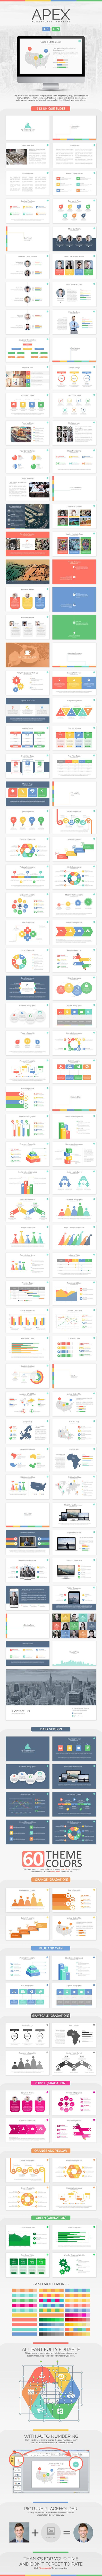 GraphicRiver Apex Multipurpose Powerpoint Presentation Template 10946530